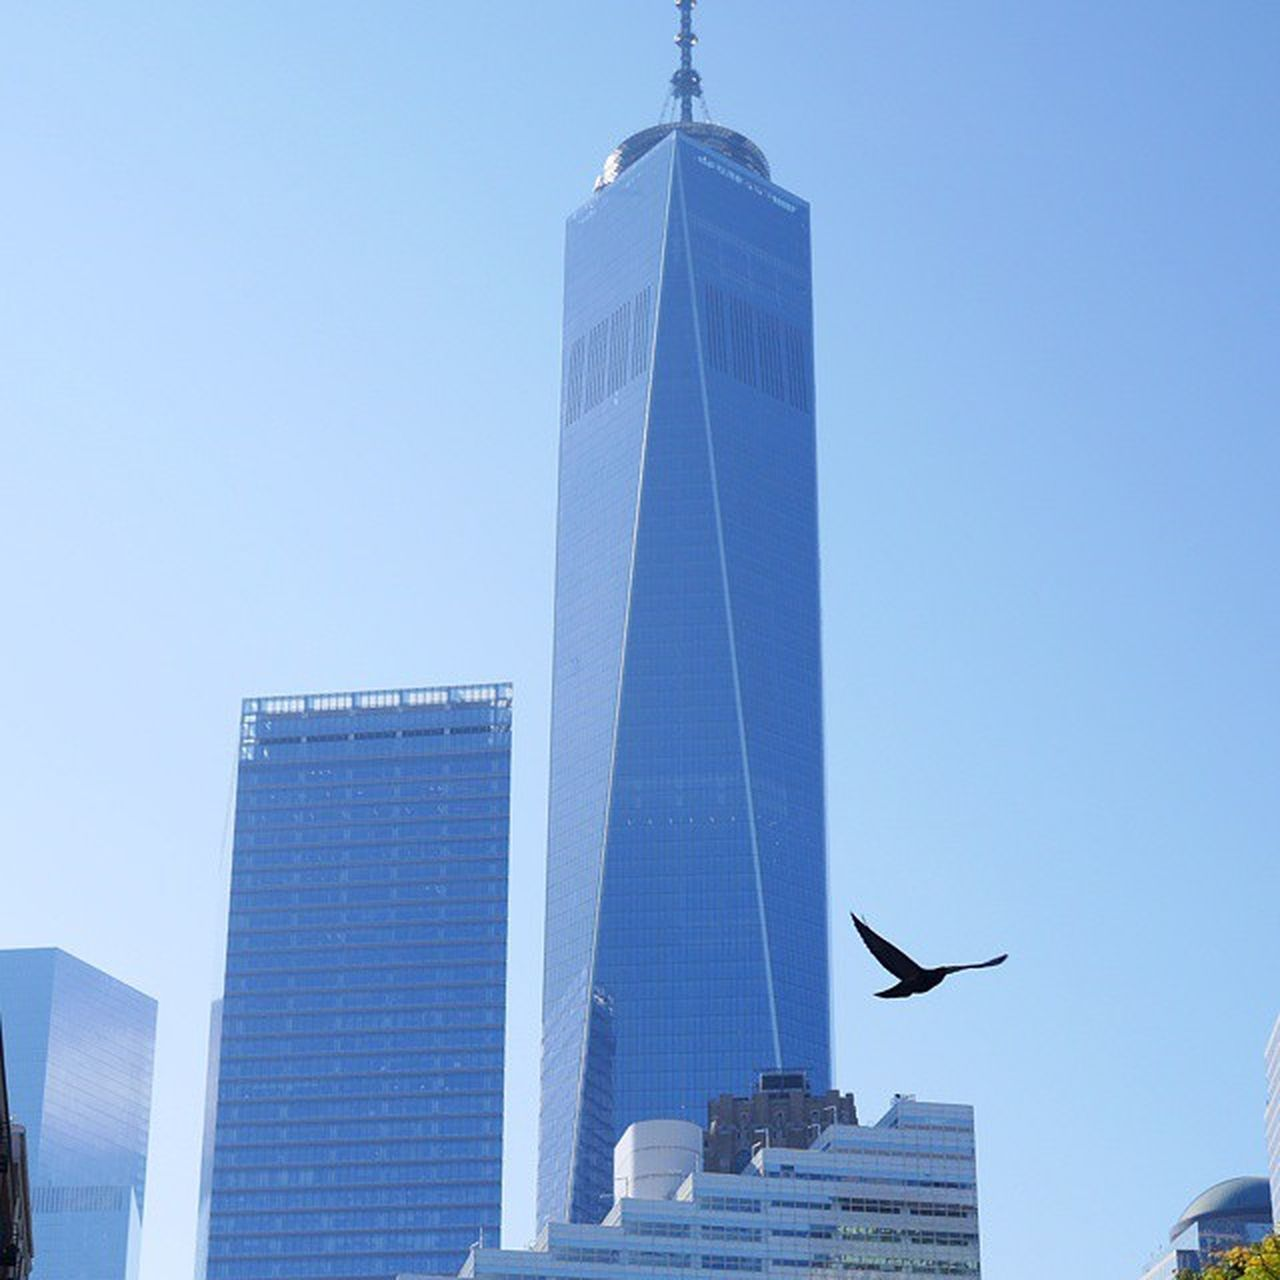 Newyork Architecture Skyscrap Summer Arkitektur Skyskrapa Sommar ImagesofNYC Blue Sky Bird